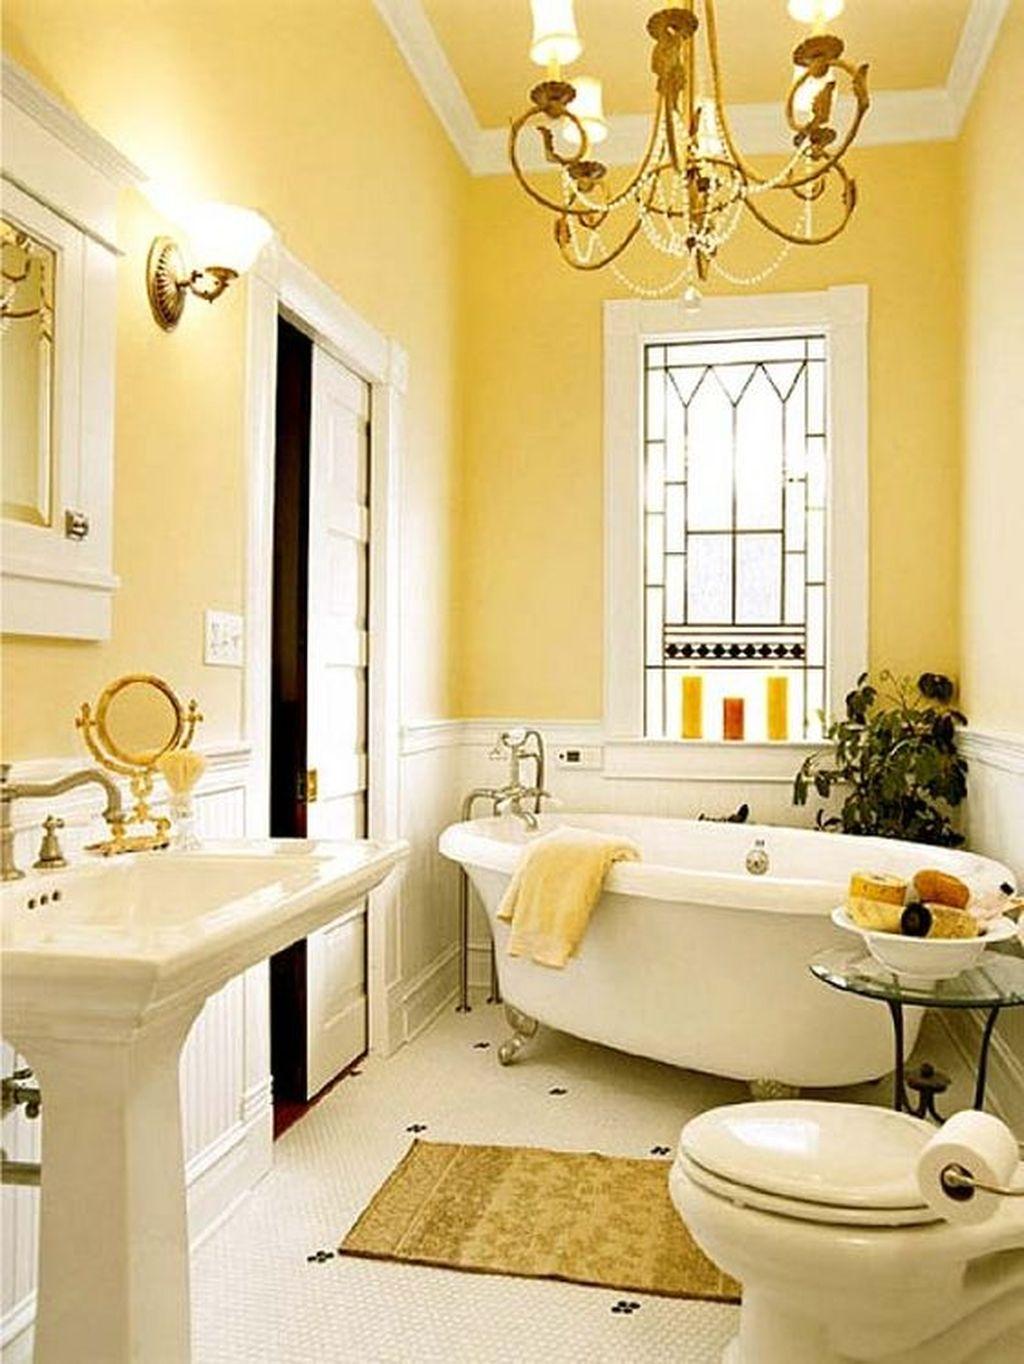 Creative Sunny Yellow Bathroom Decor For Summer 40